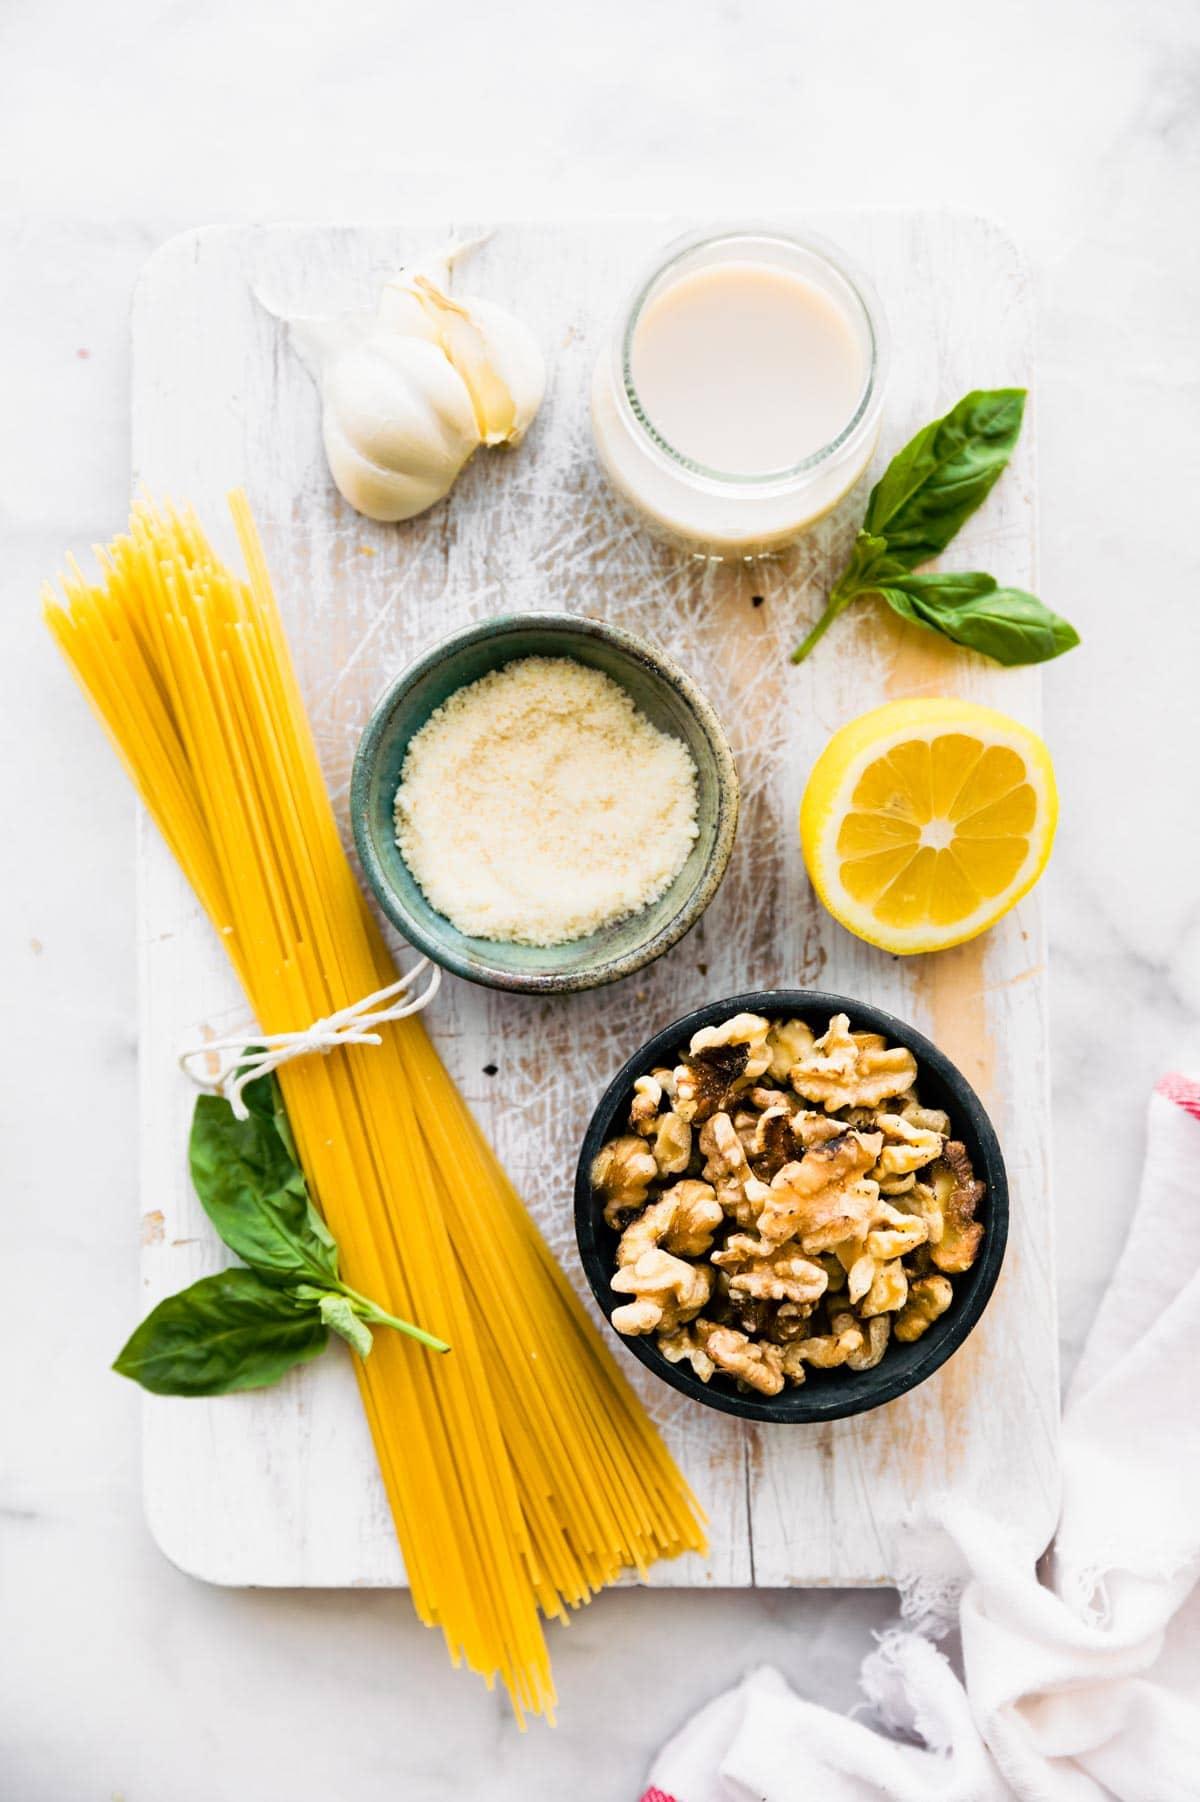 uncooked ingredients on wood cutting board to make vegan pasta recipe